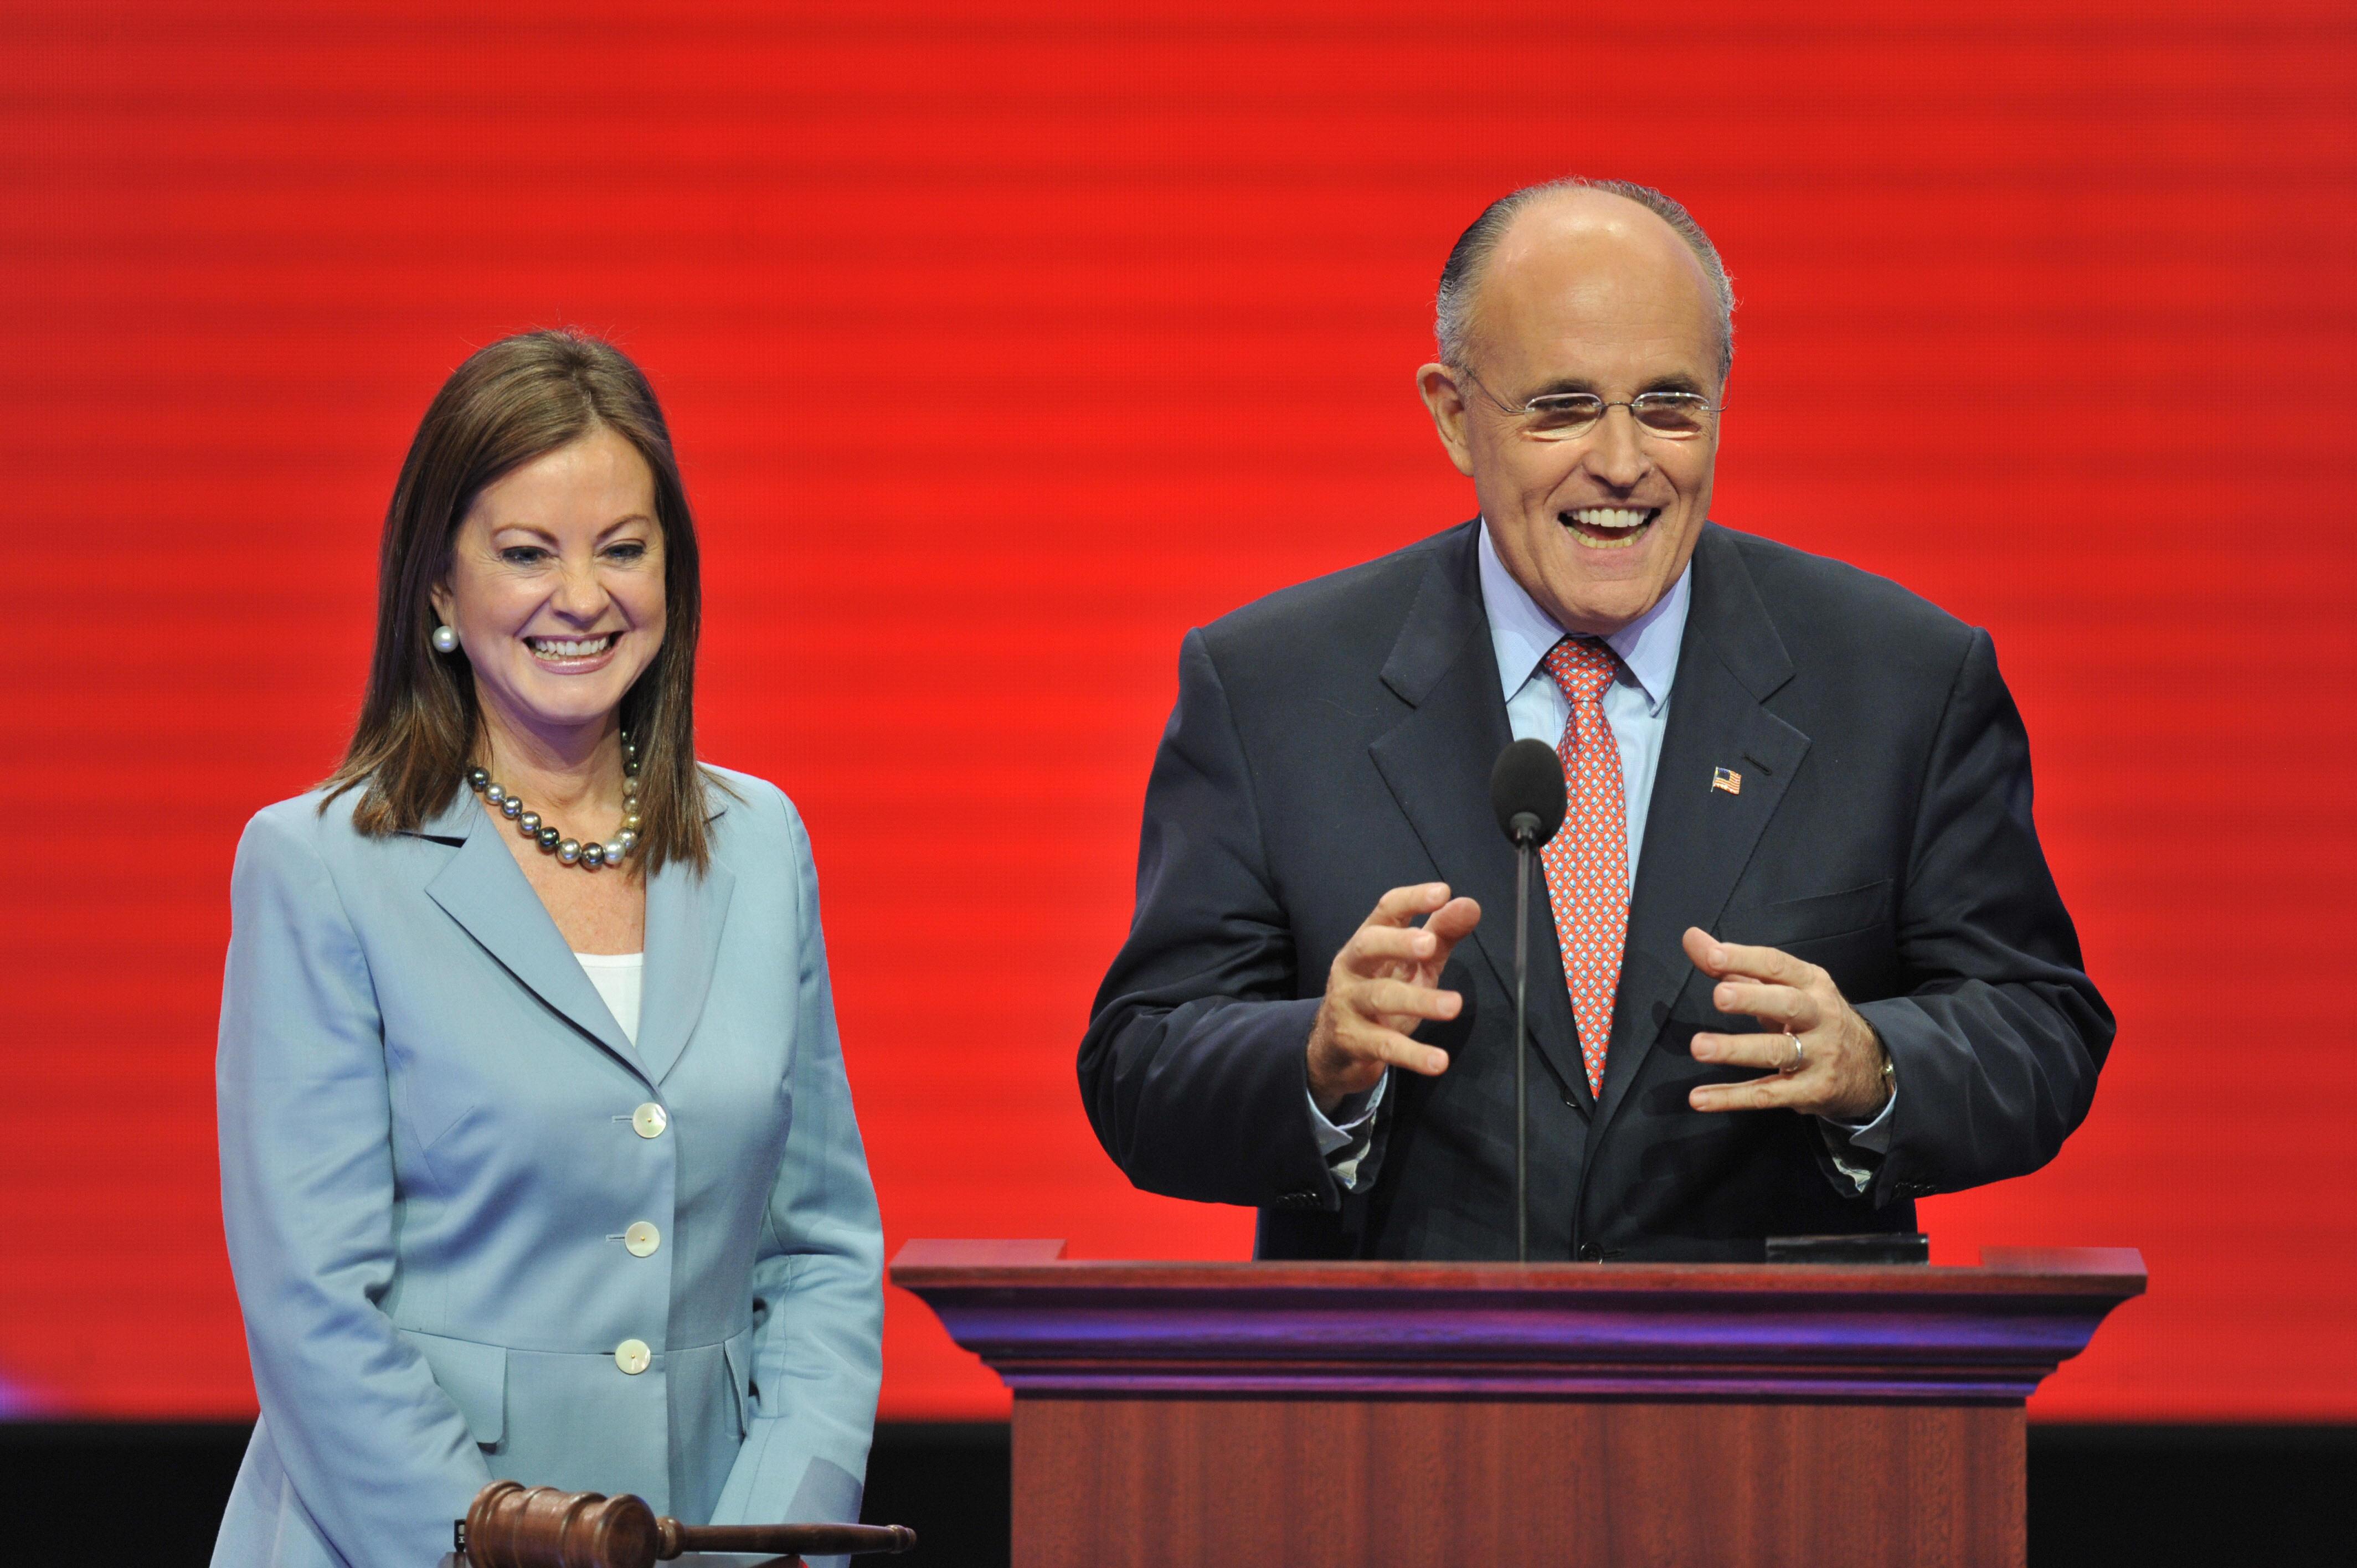 Rudy Giuliani and his wife Judith